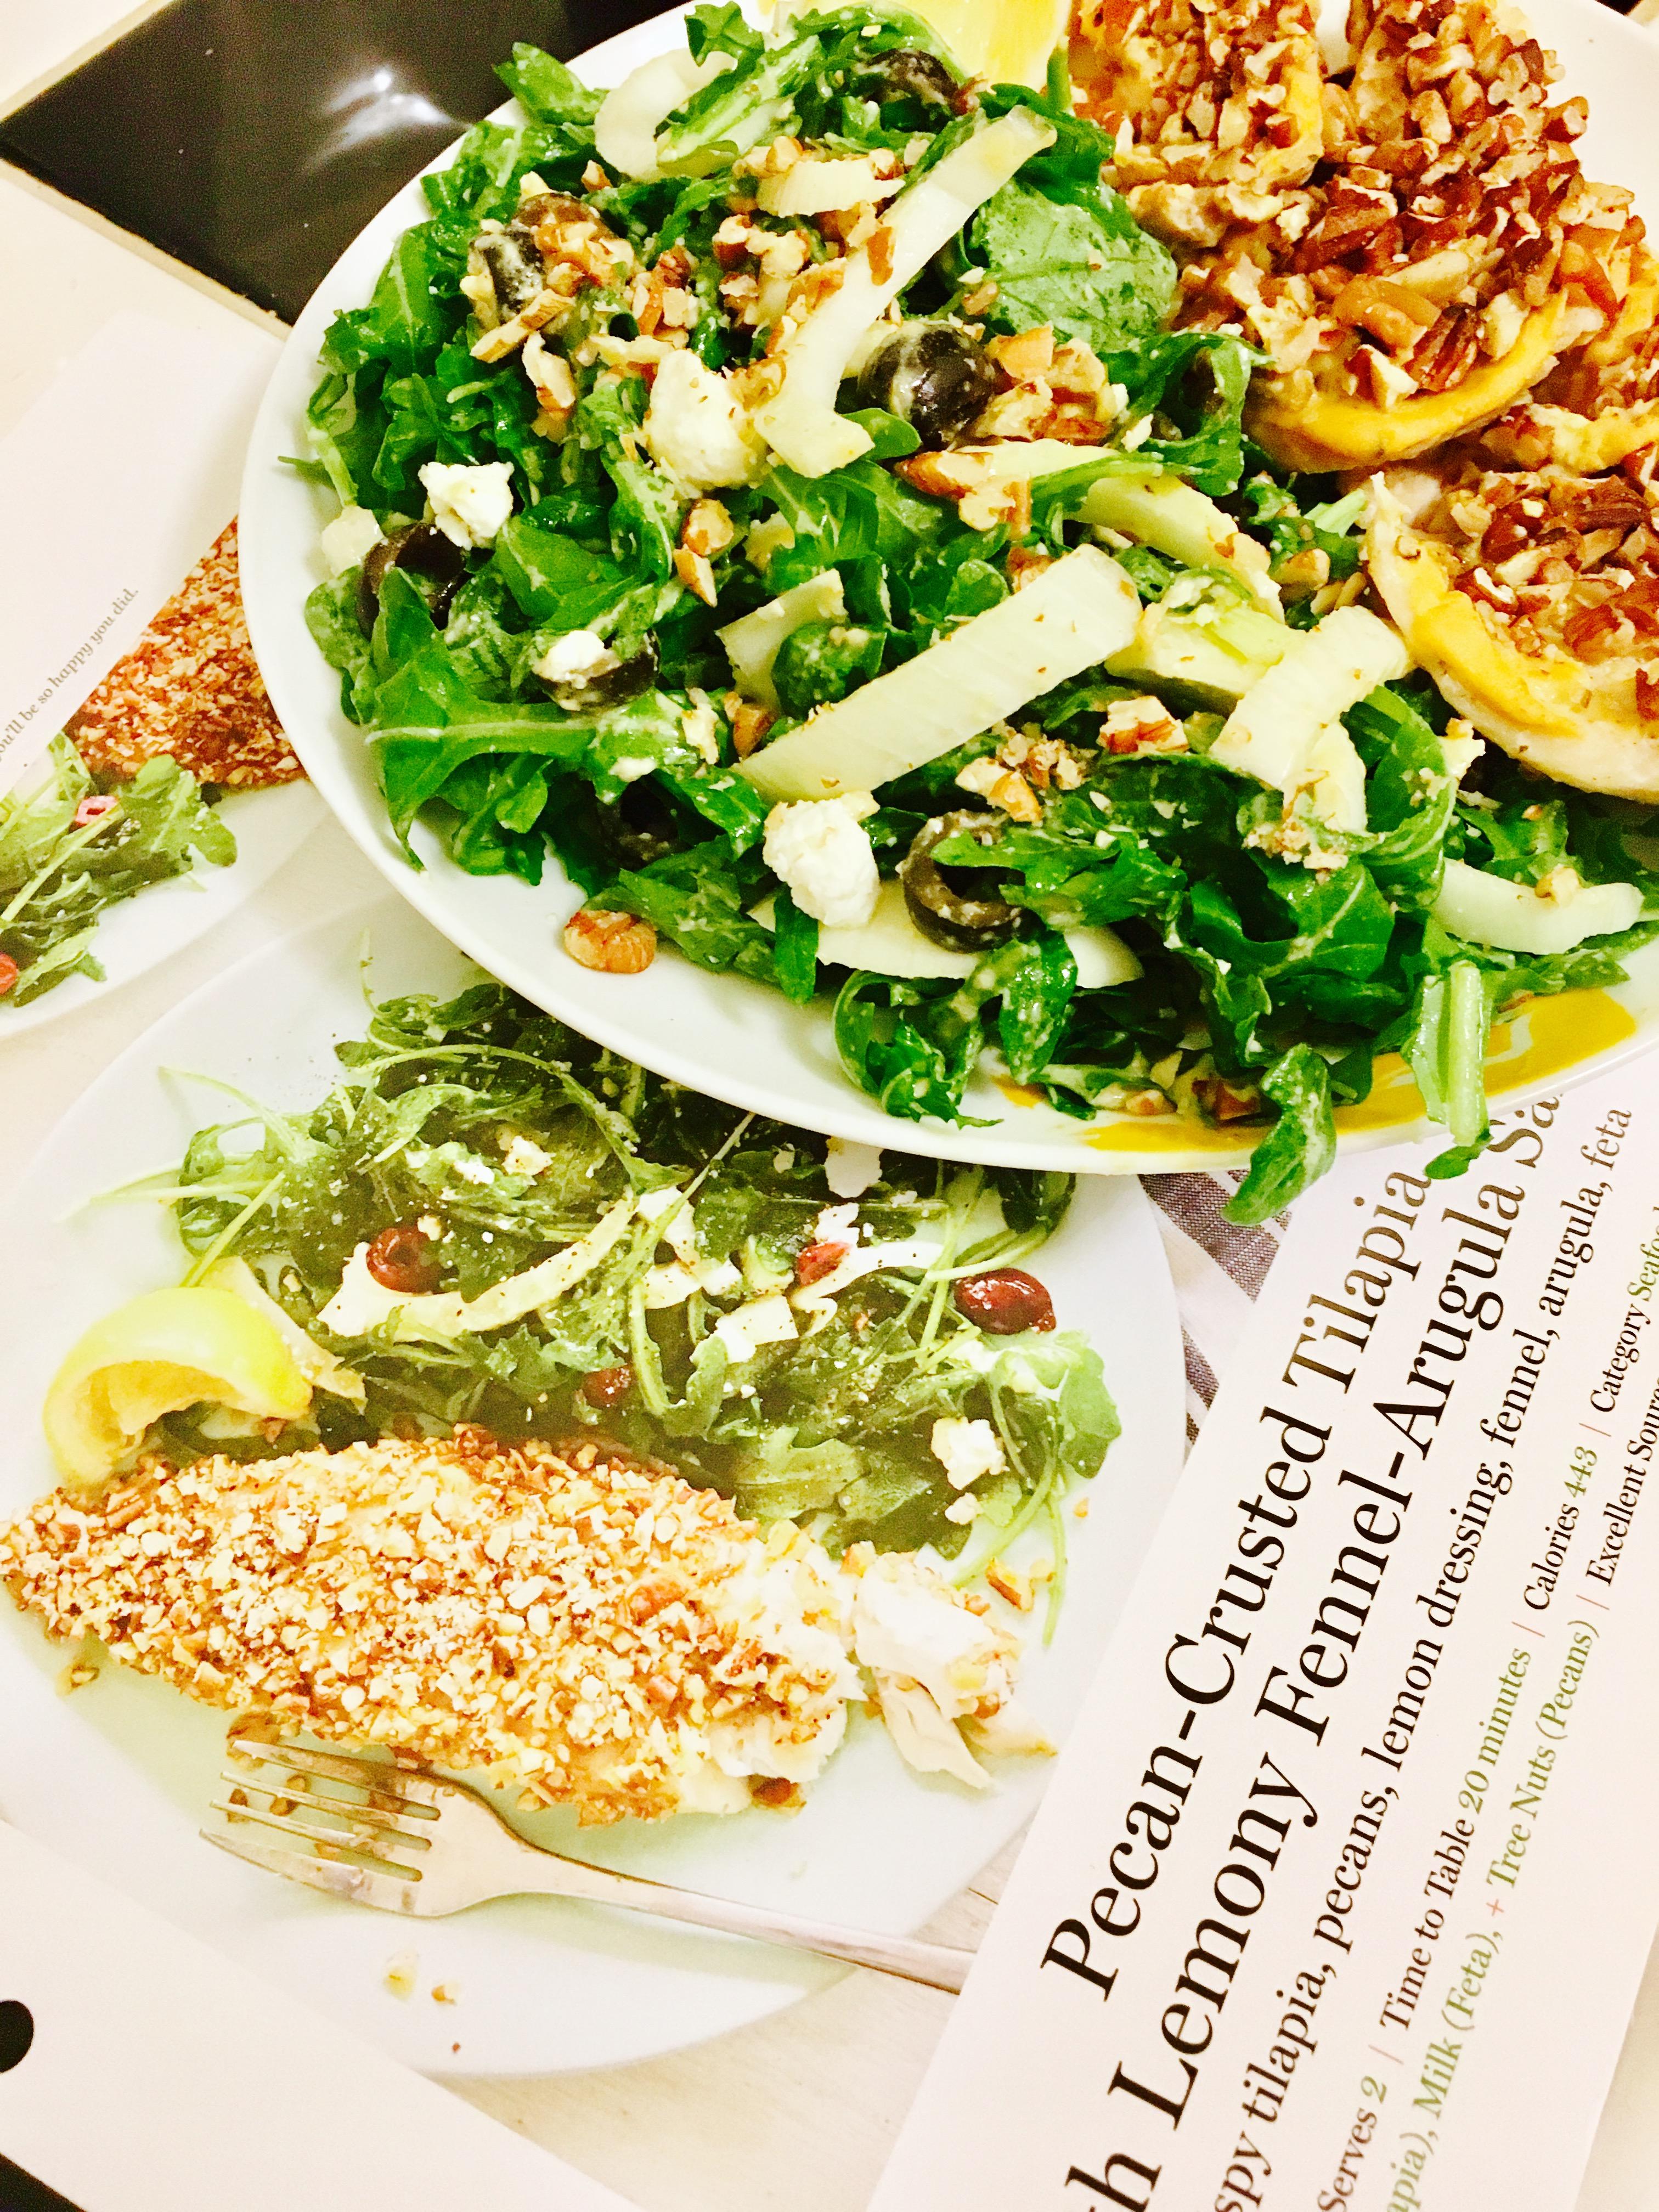 Pecan-Crusted Tilapia with Lemony Fennel-Arugula Salad